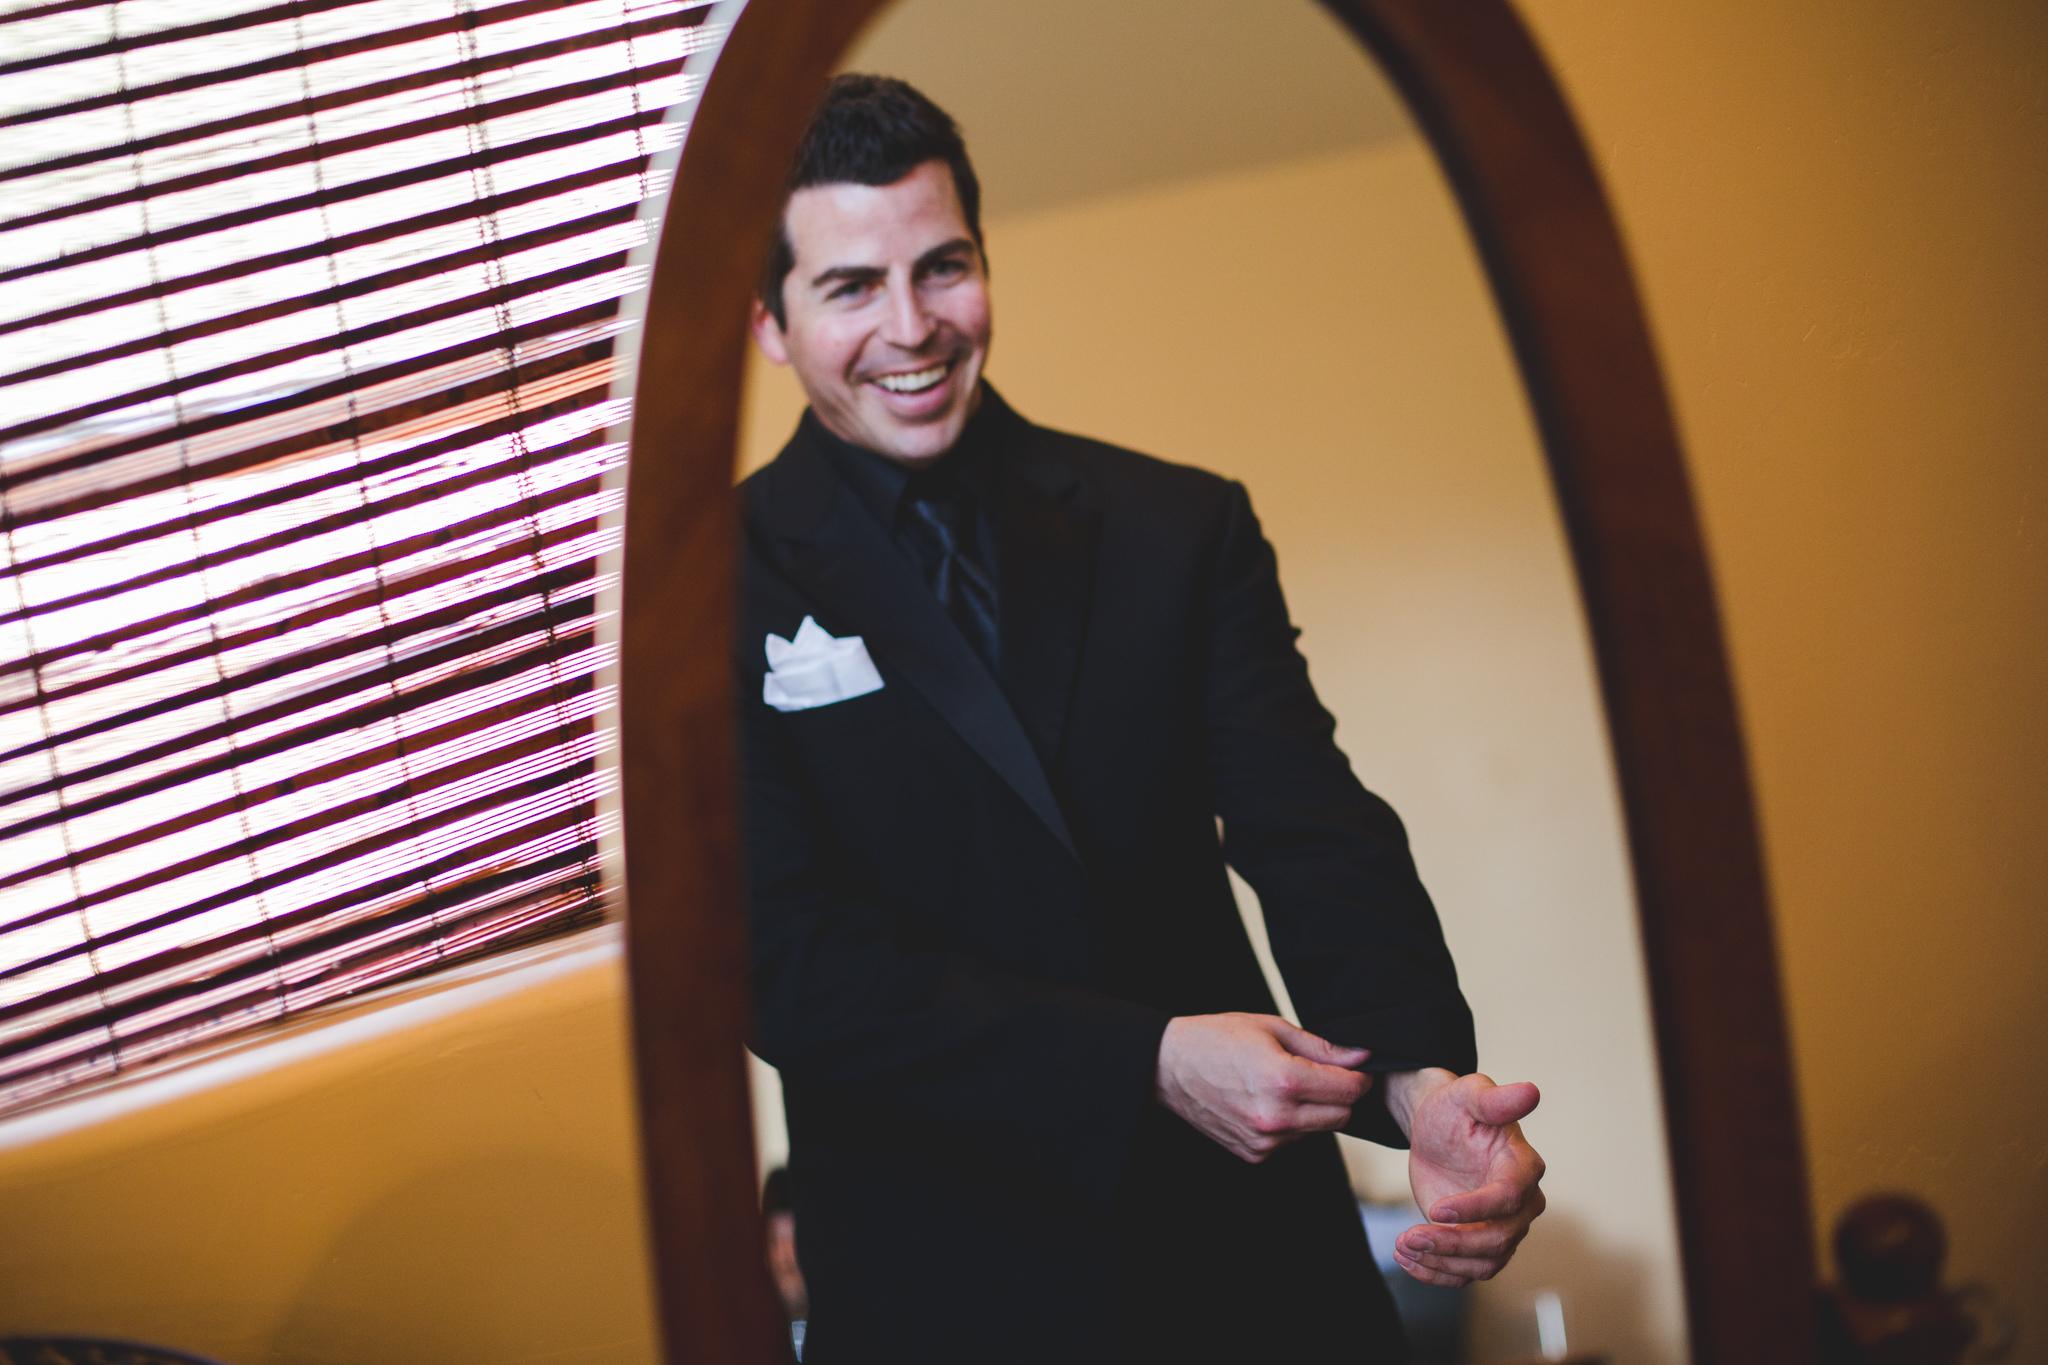 groom smiling in mirror phoenix wedding photography mj